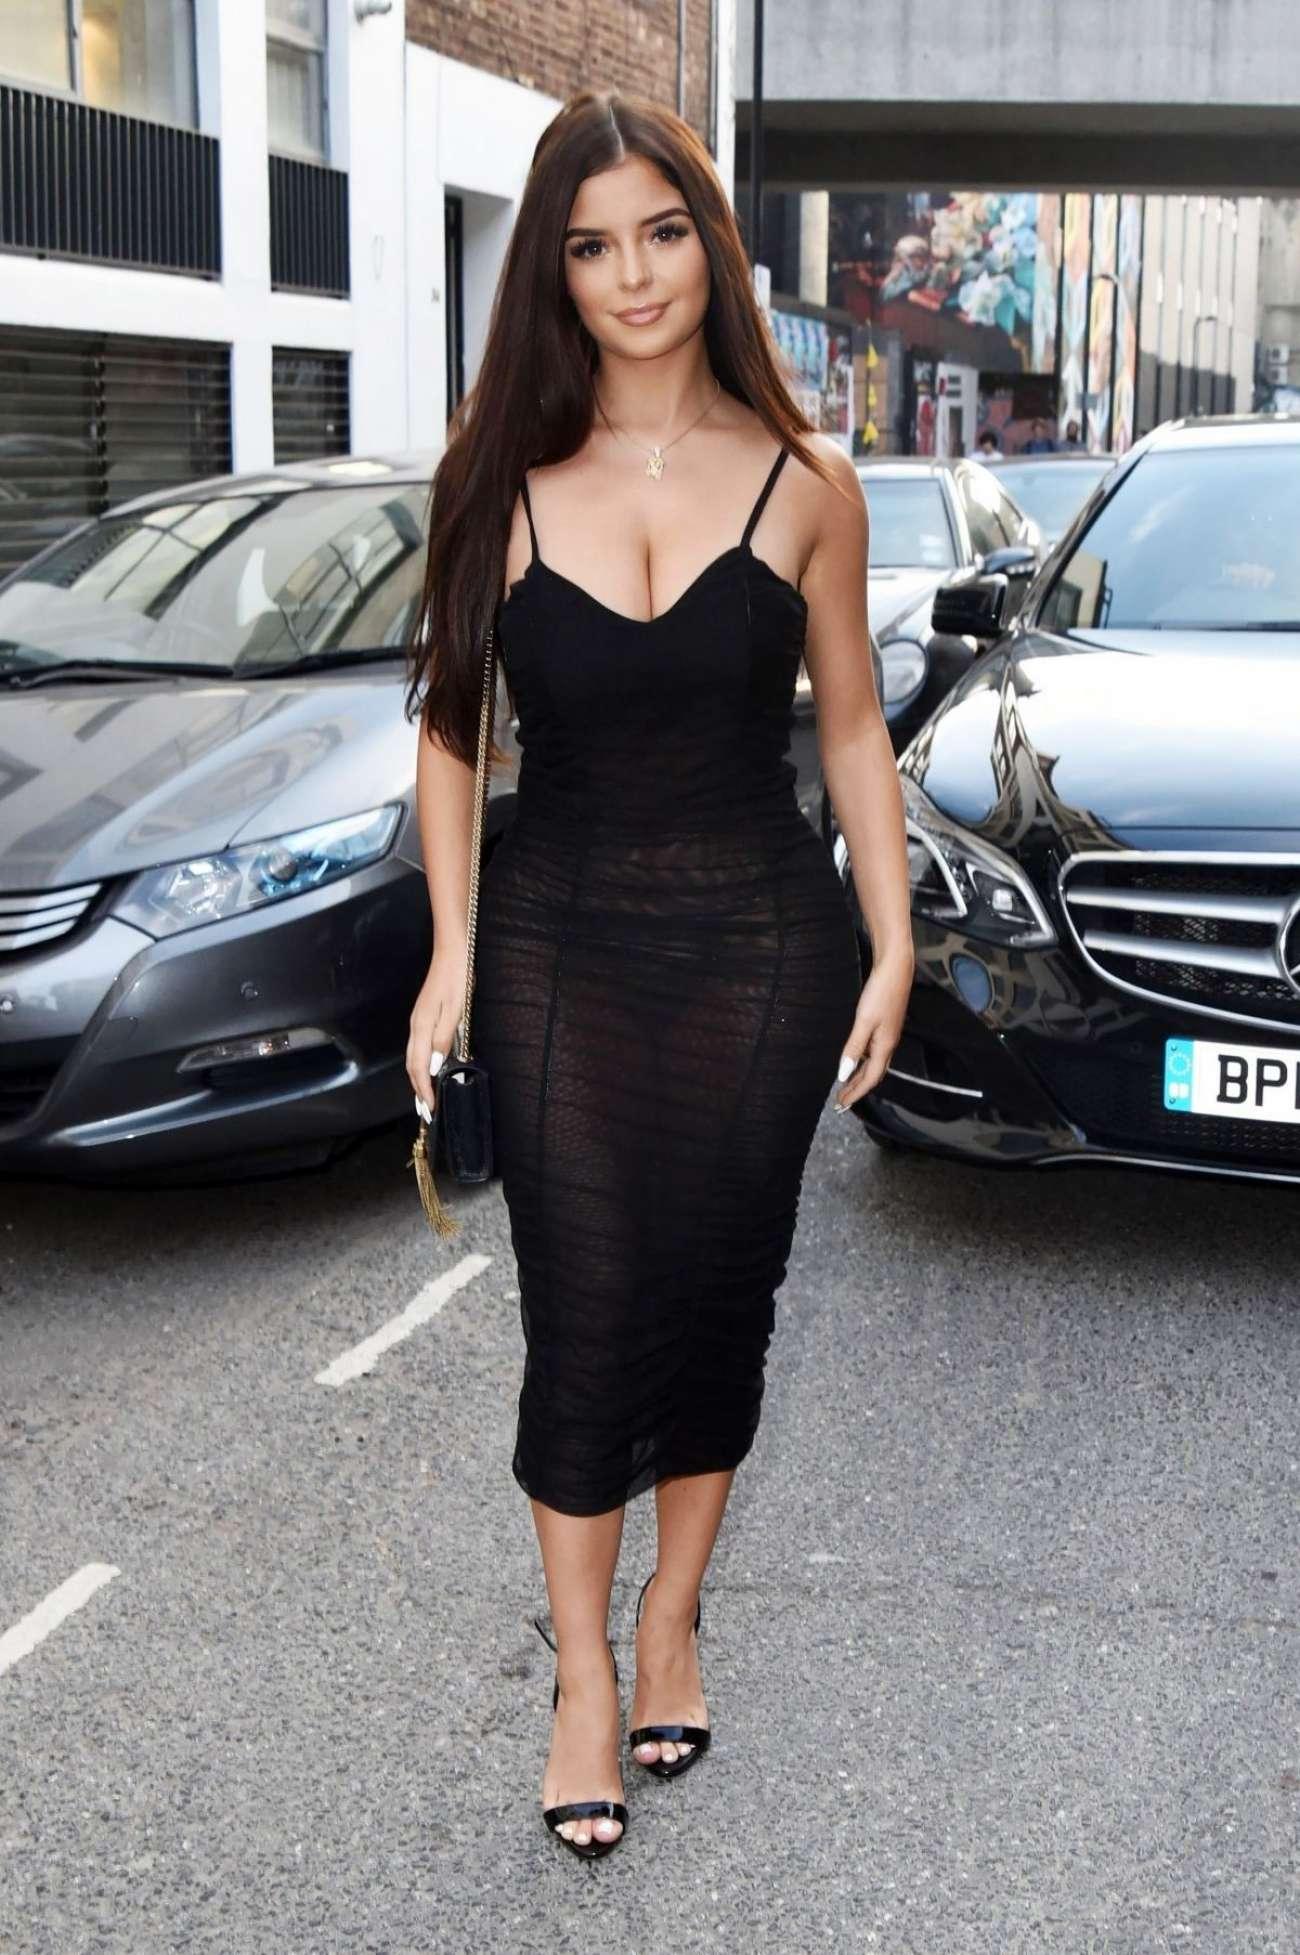 Demi Rose Mawby 2018 : Demi Rose Mawby: Skinny Dip Event In London-07